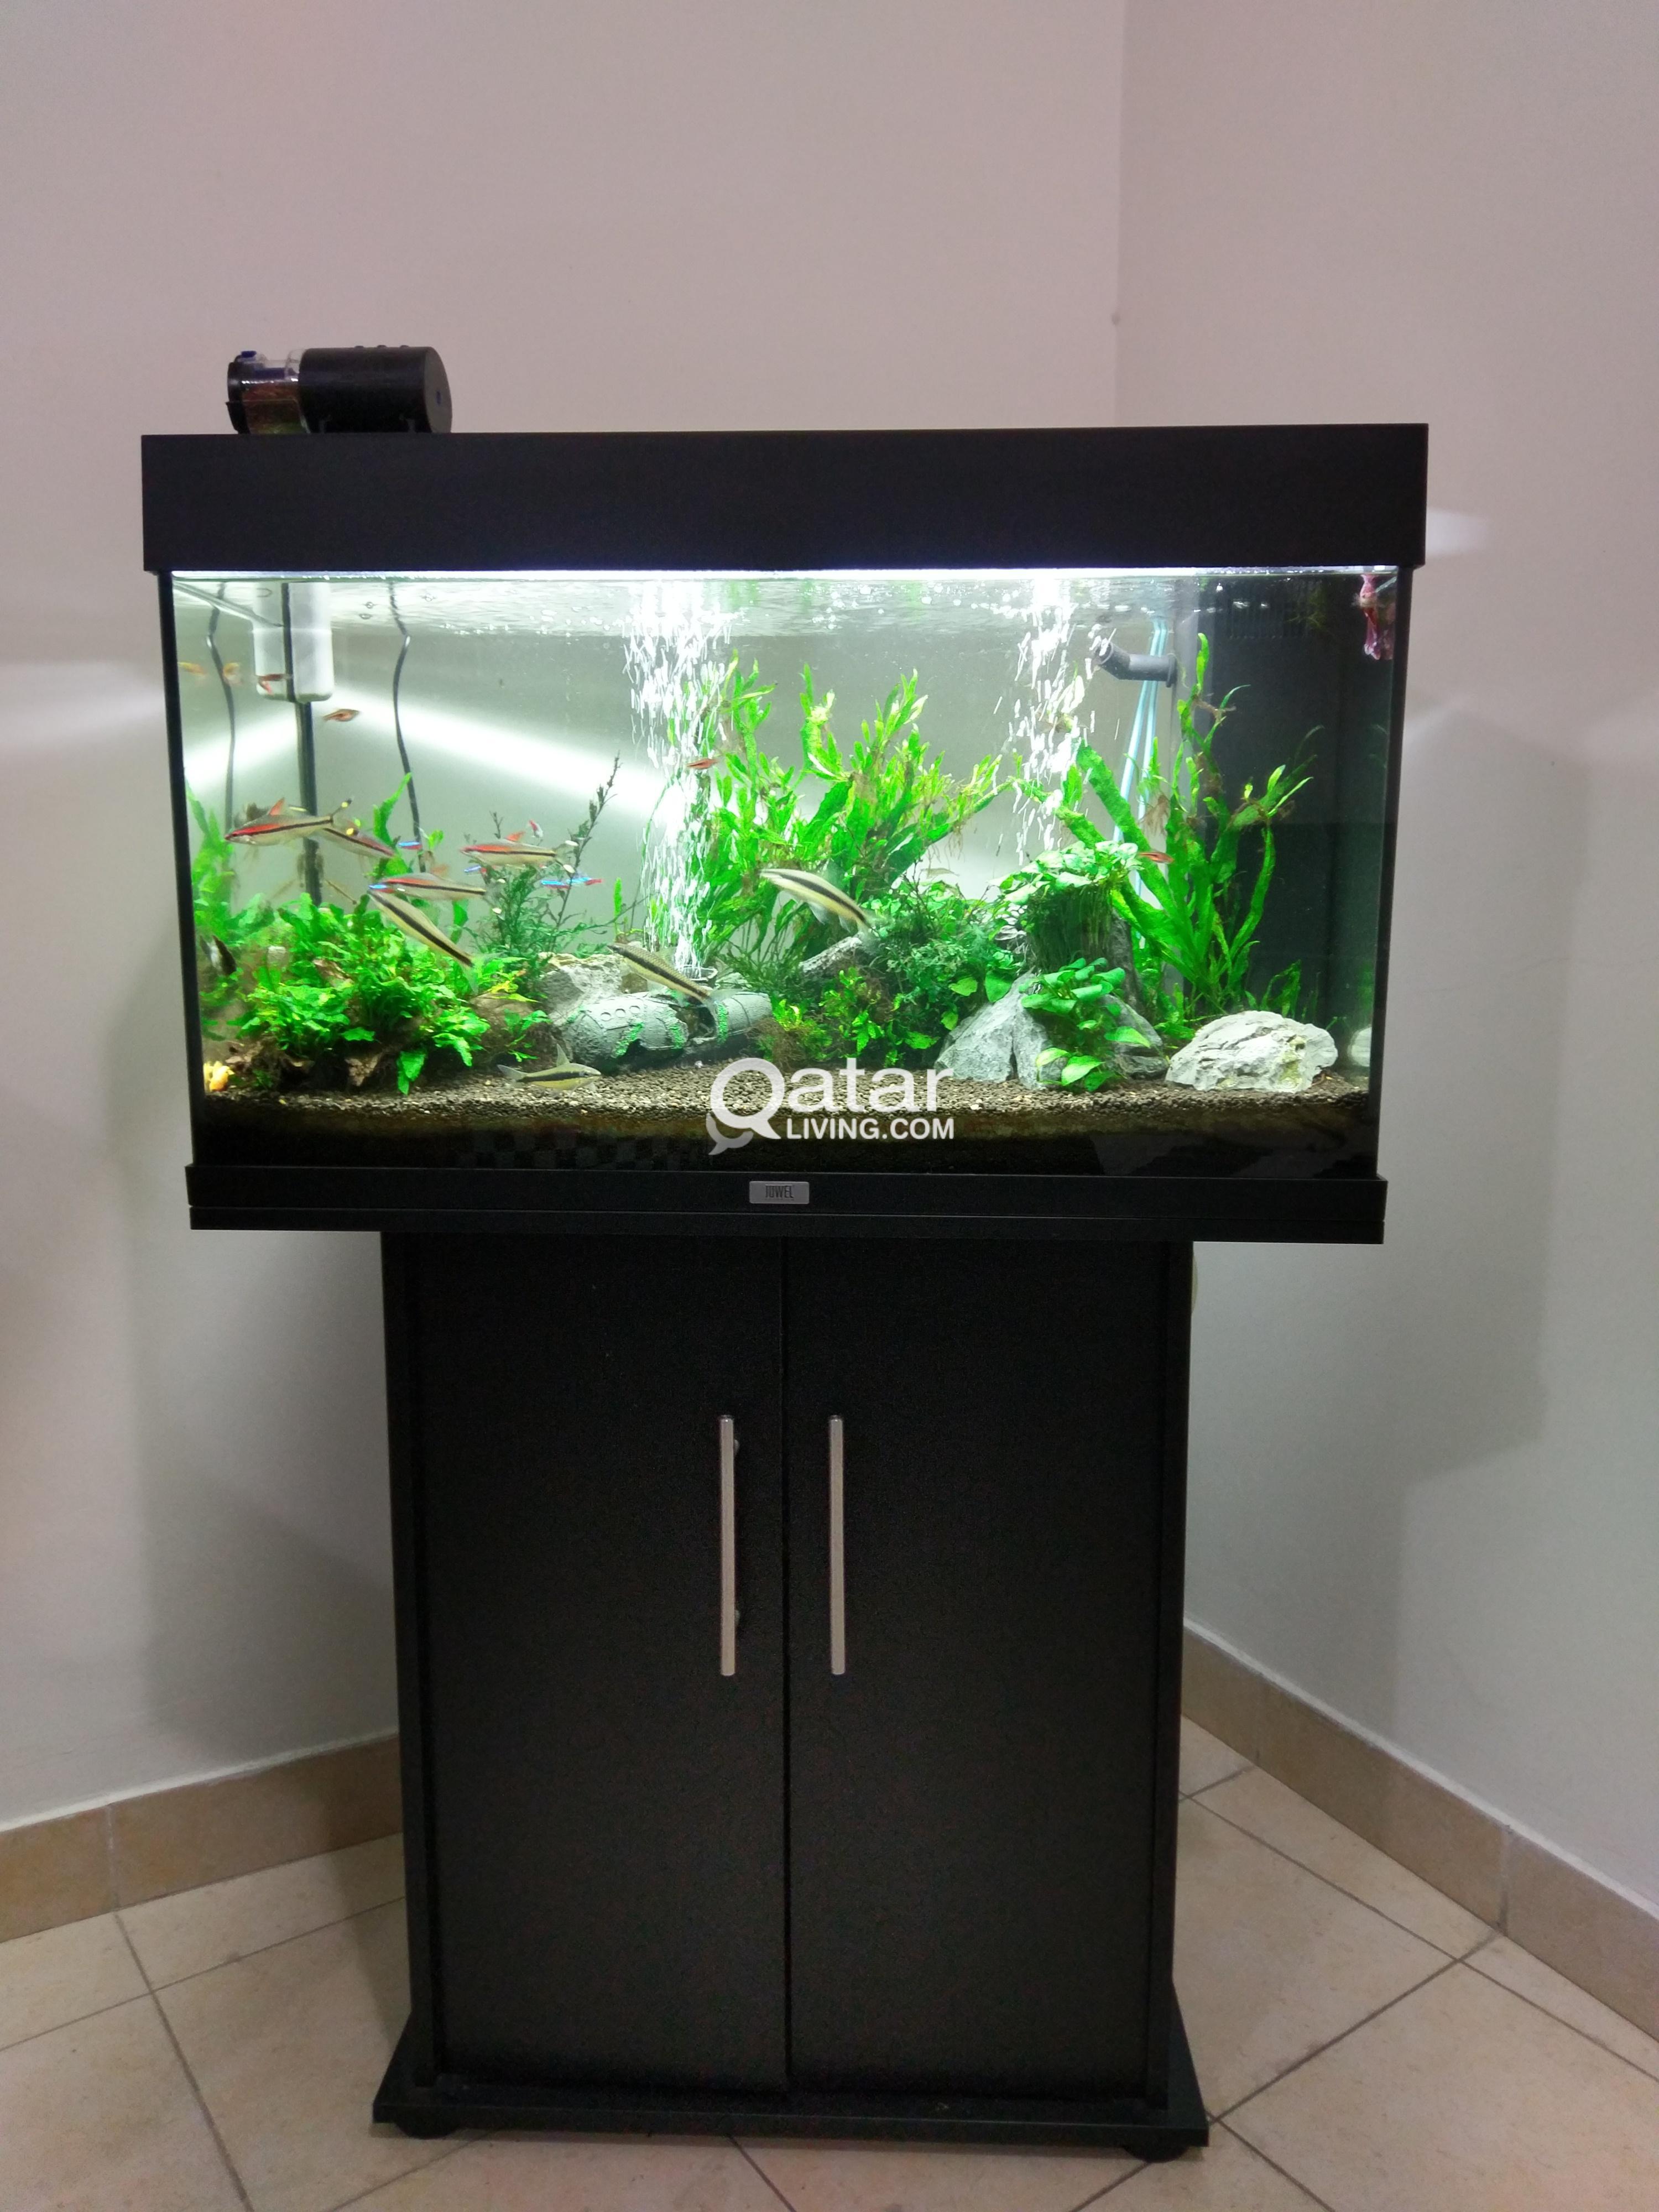 Branded aquarium fish tank for sale qatar living for Tropical fish tanks for sale